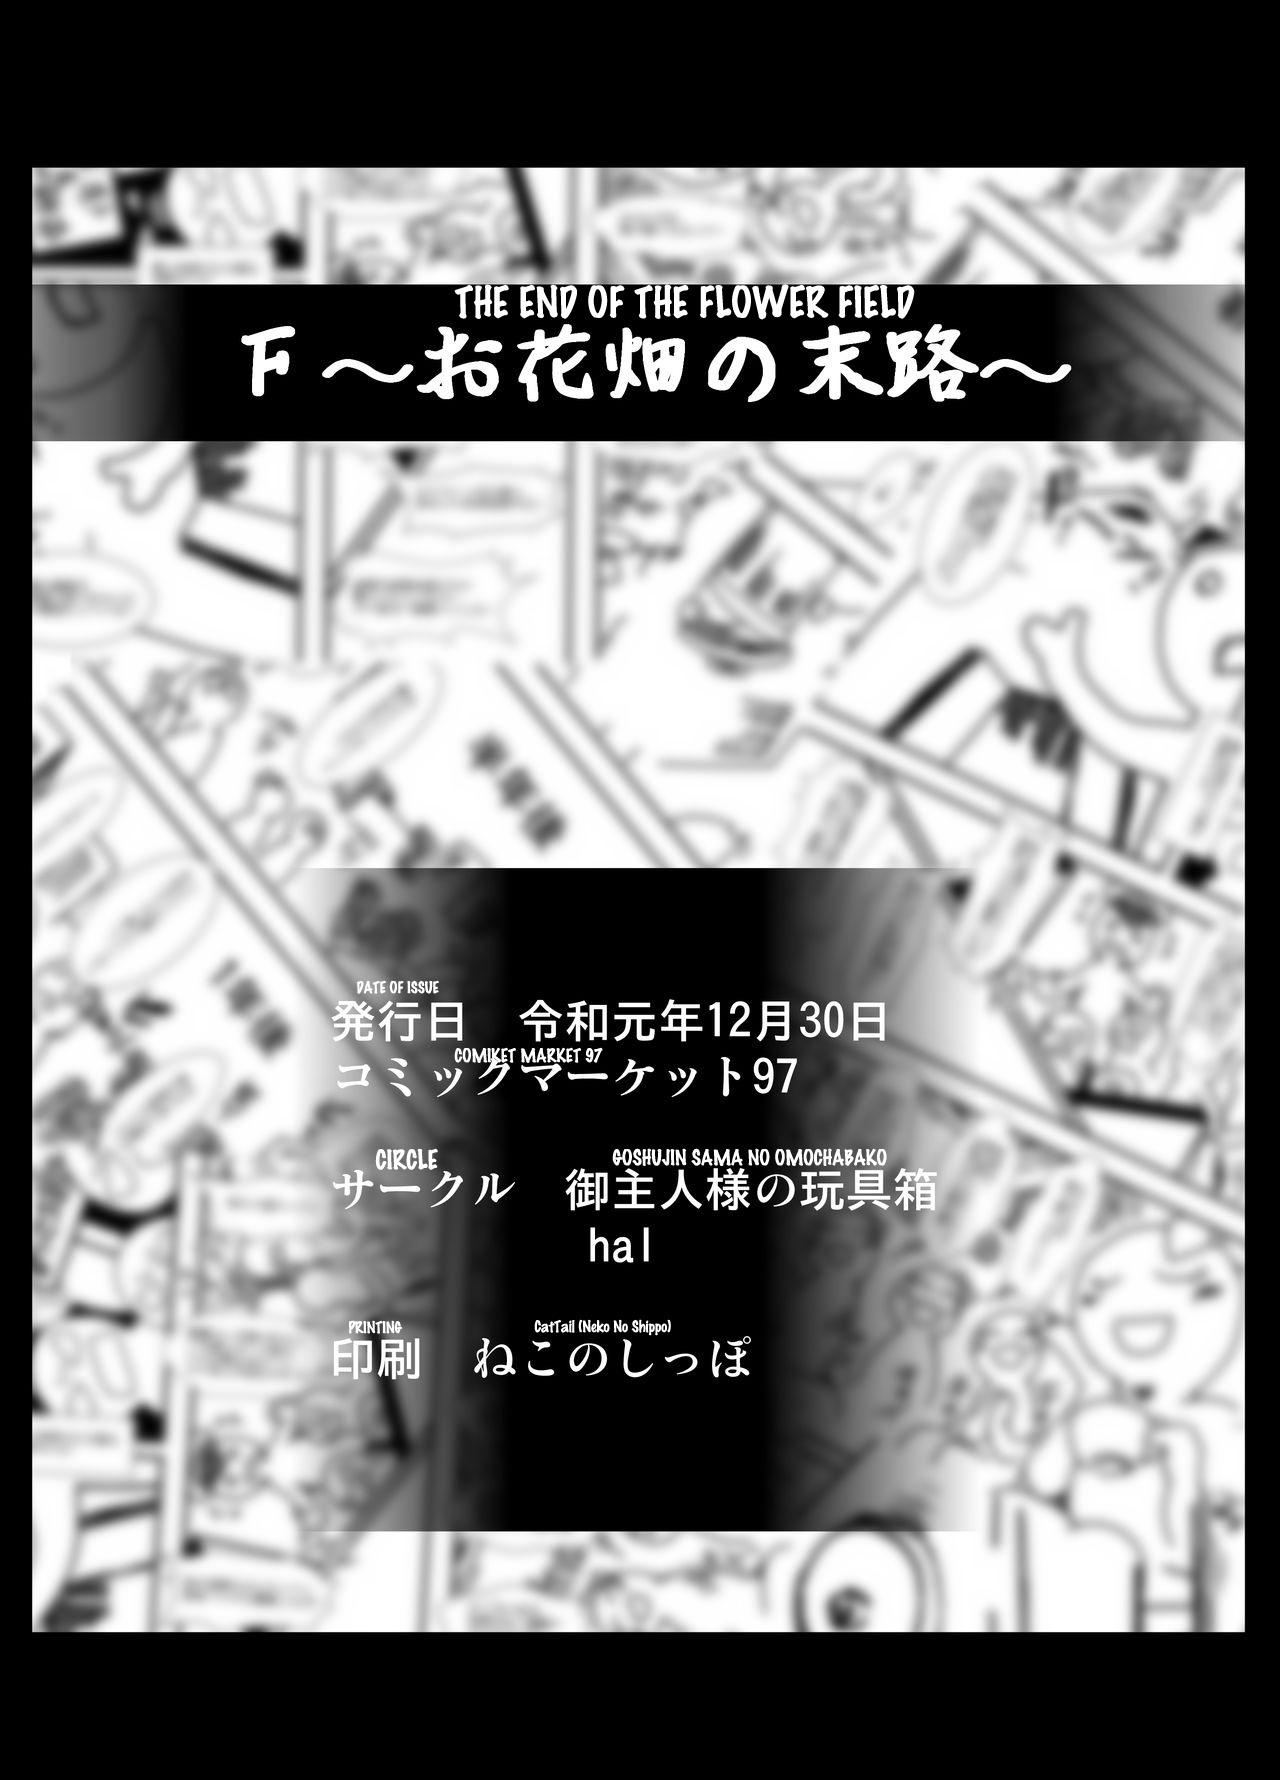 [Goshujinsama no Omochabako (hal)] F ~Ohanabatake no Matsuro~ | F ~ The End of the Flower Field ~ [English] [TAIPAN TRANSLATIONS] [Digital] 53